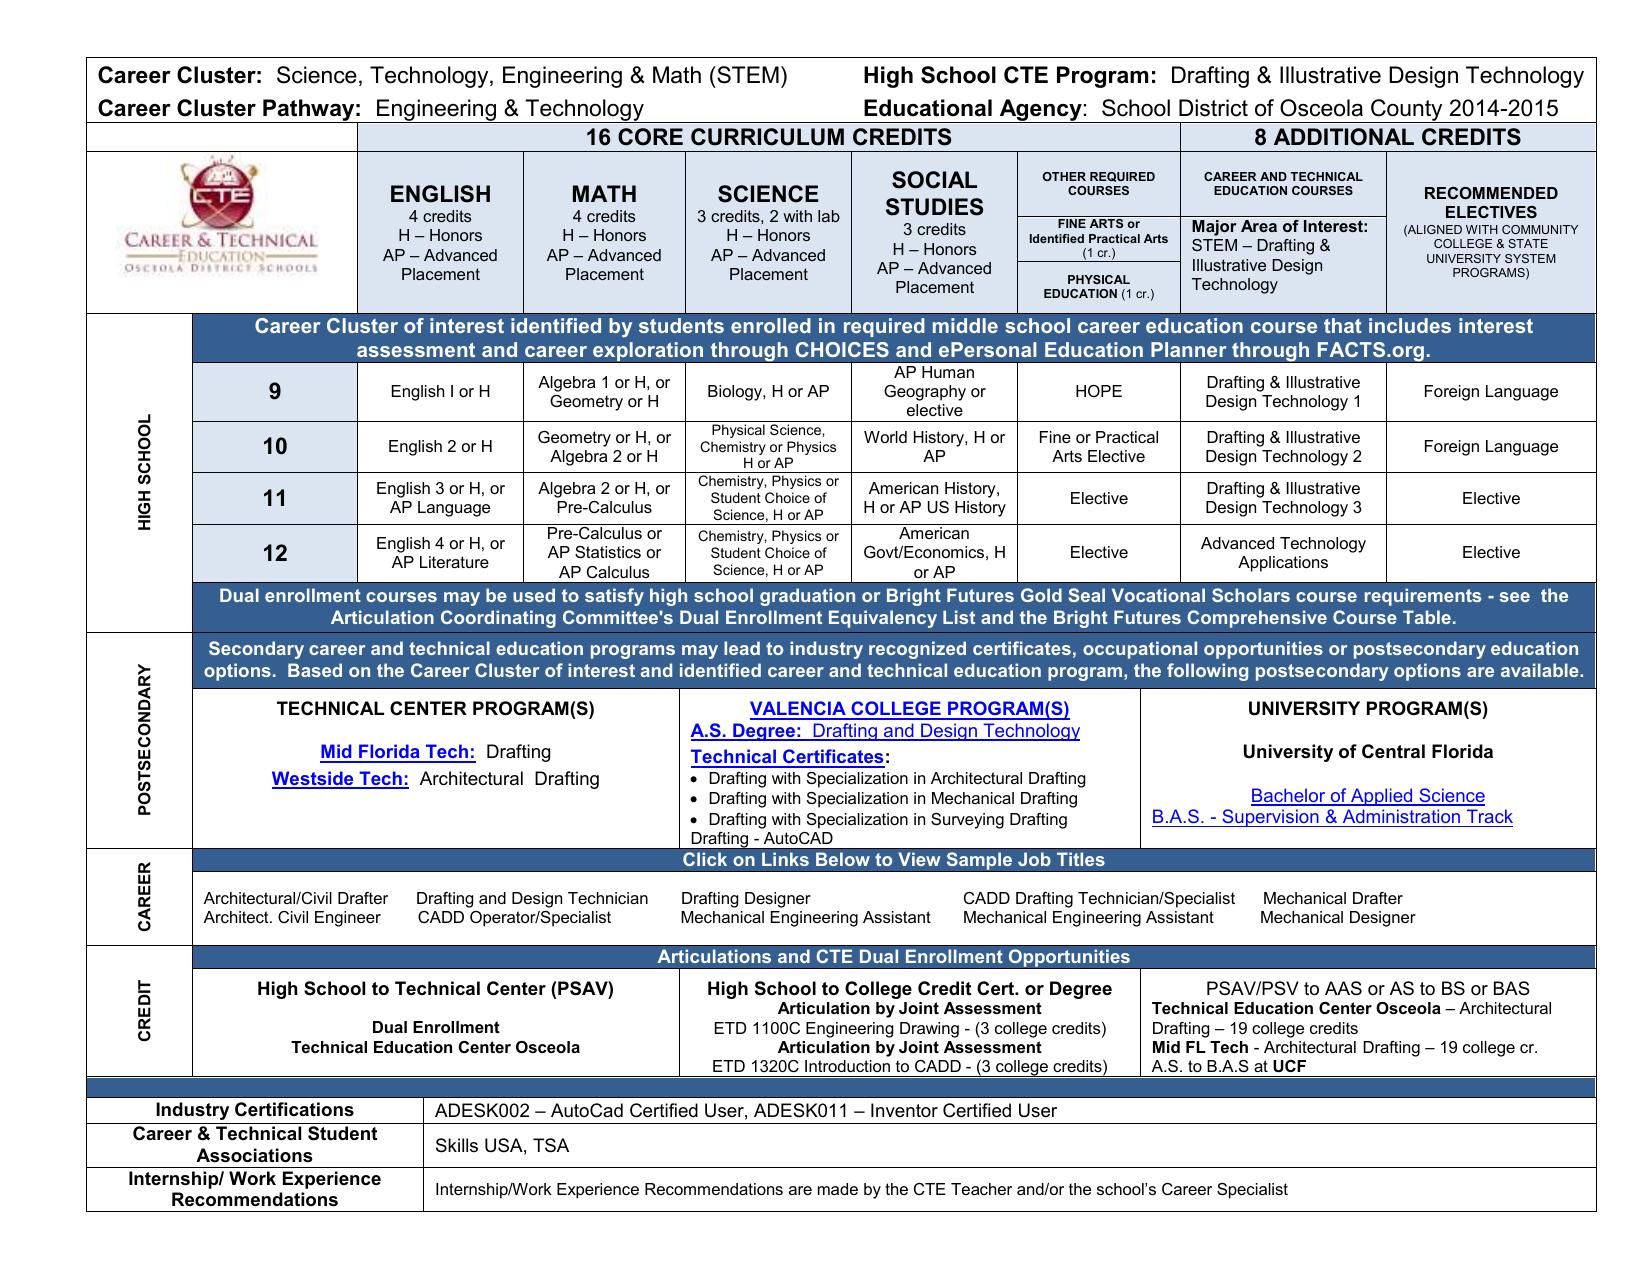 Career Cluster High School Cte Program Career Cluster Pathway